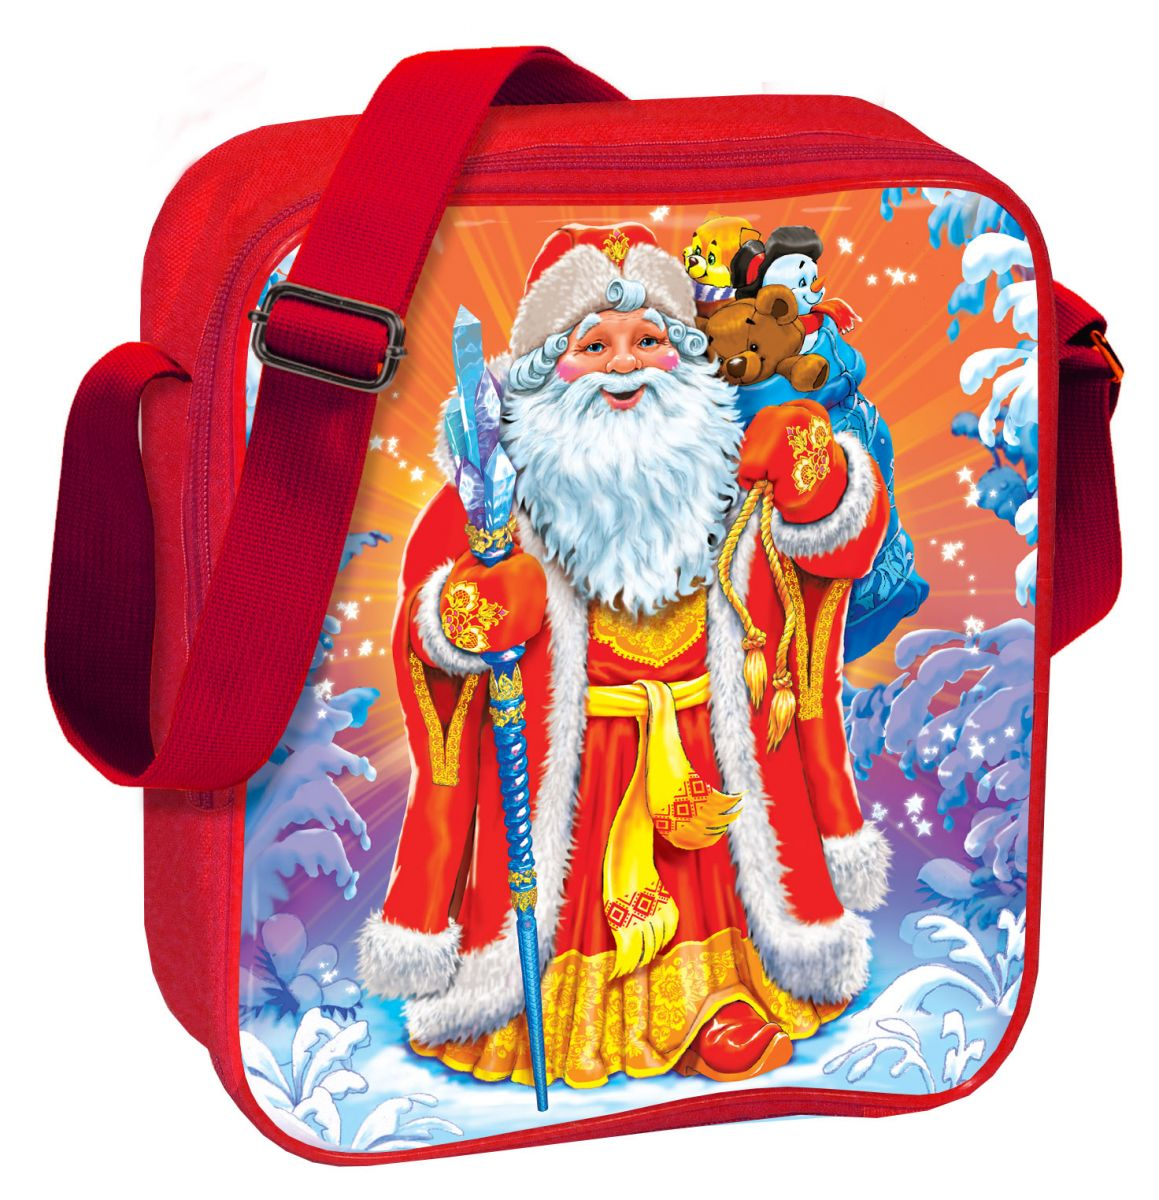 Термосумка Дед Мороз 700 грамм